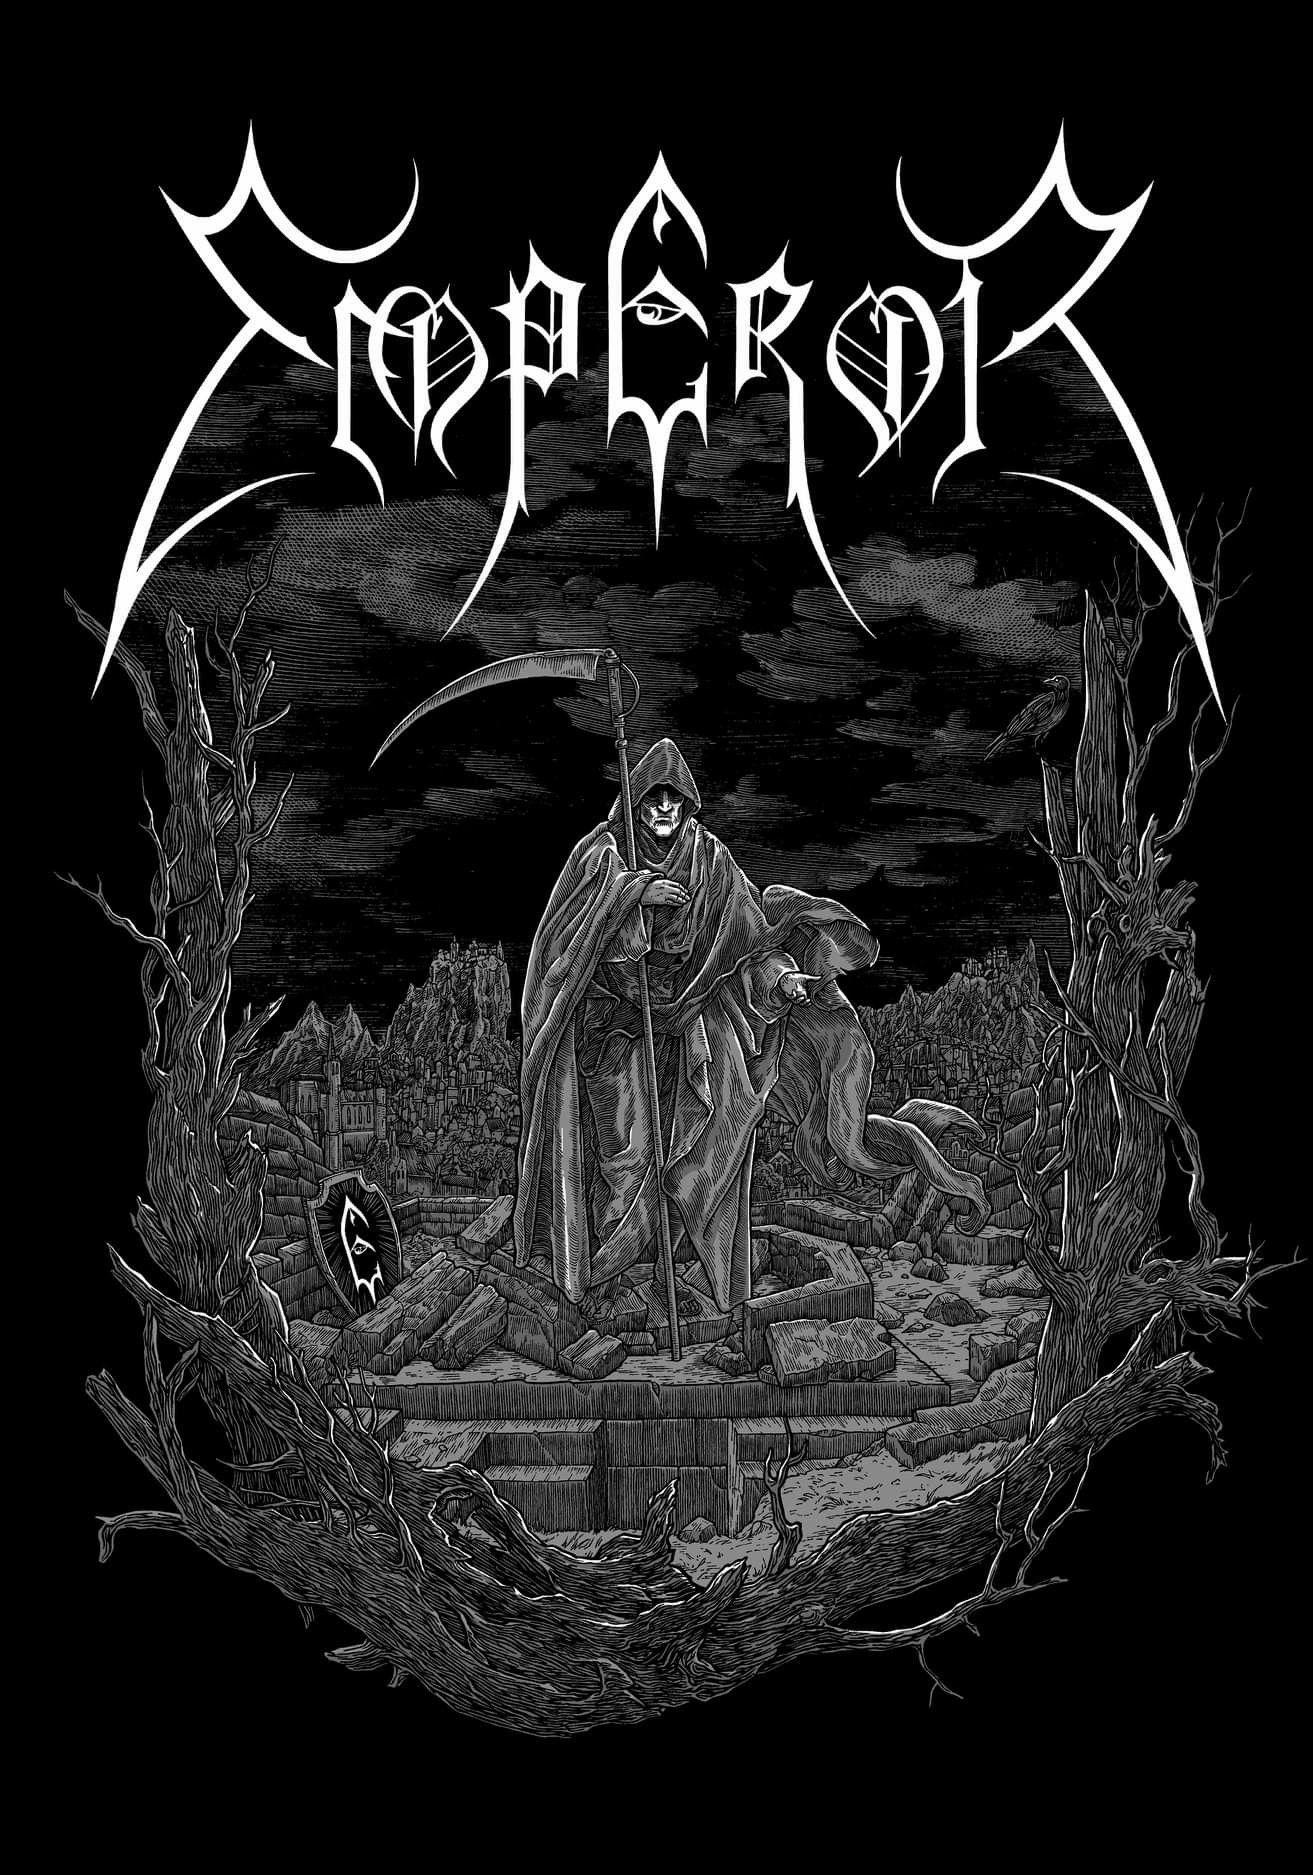 Emperor Black Metal Art Metal Band Logos Metal Music Bands